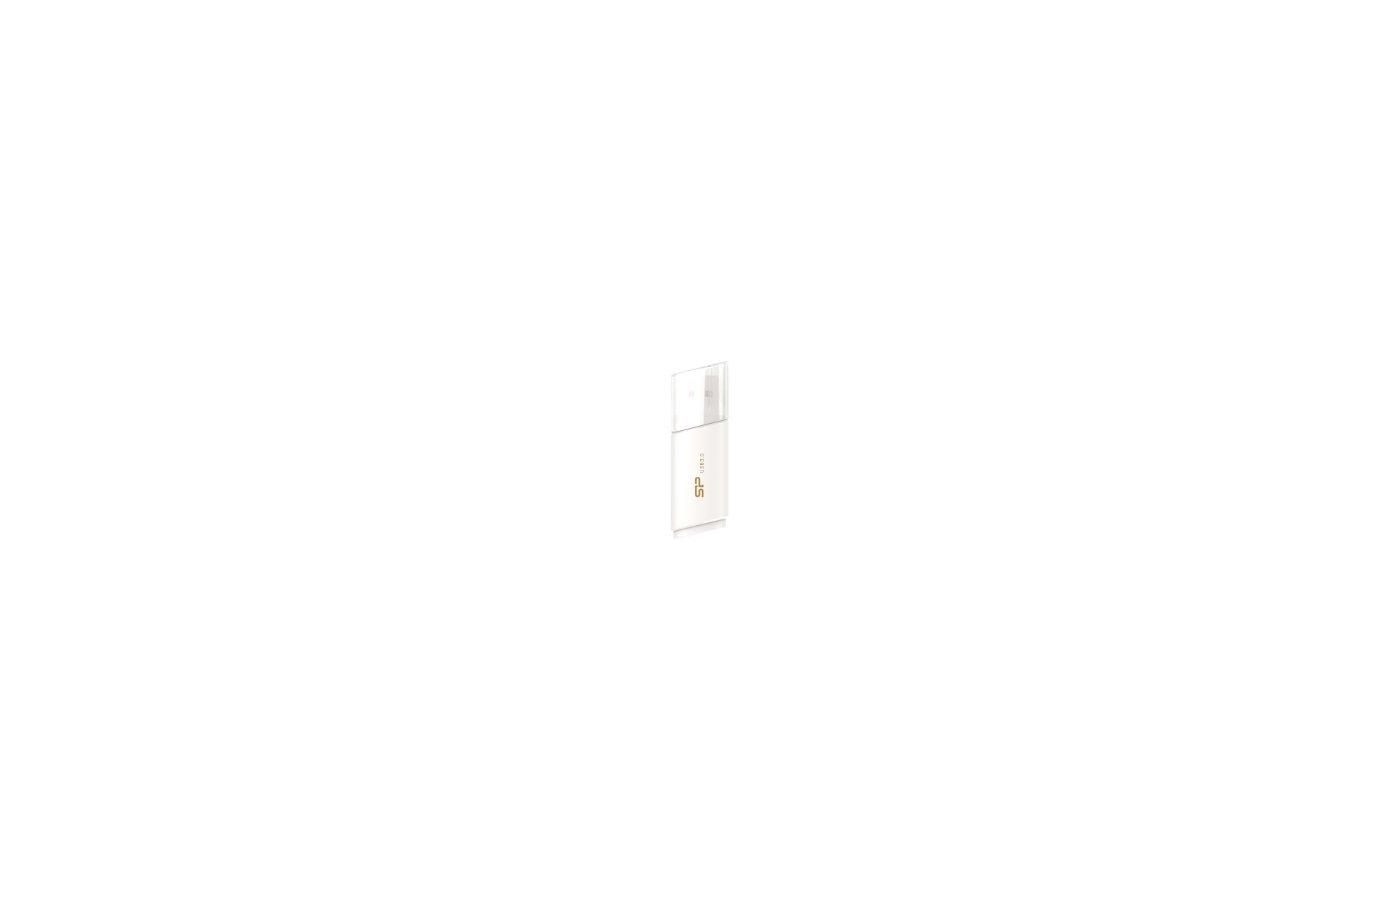 Флеш-диск USB 3.0 Флеш-накопитель 32GB Silicon Power Blaze B06 White